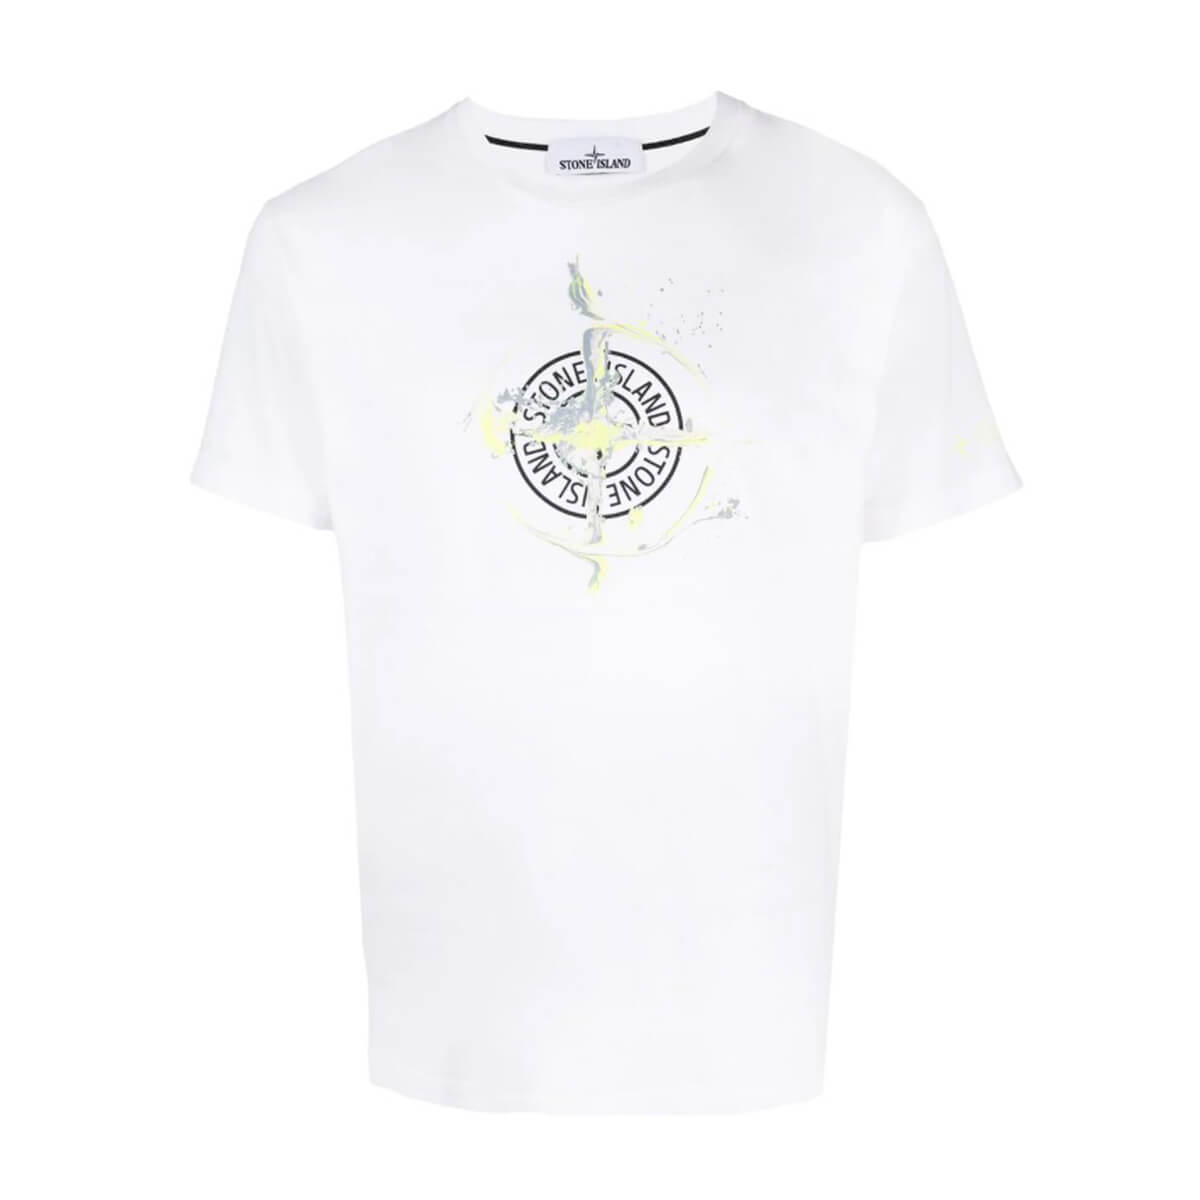 SPRING SUMMER 2021 Stone IslandLogo-Print T-Shirt Τυπωμένο λογότυπο Στρογγυλή λαιμόκοψη Κοντά μανίκια Μέγεθος δείγματος: M Σύνθεση: 100% Βαμβάκι